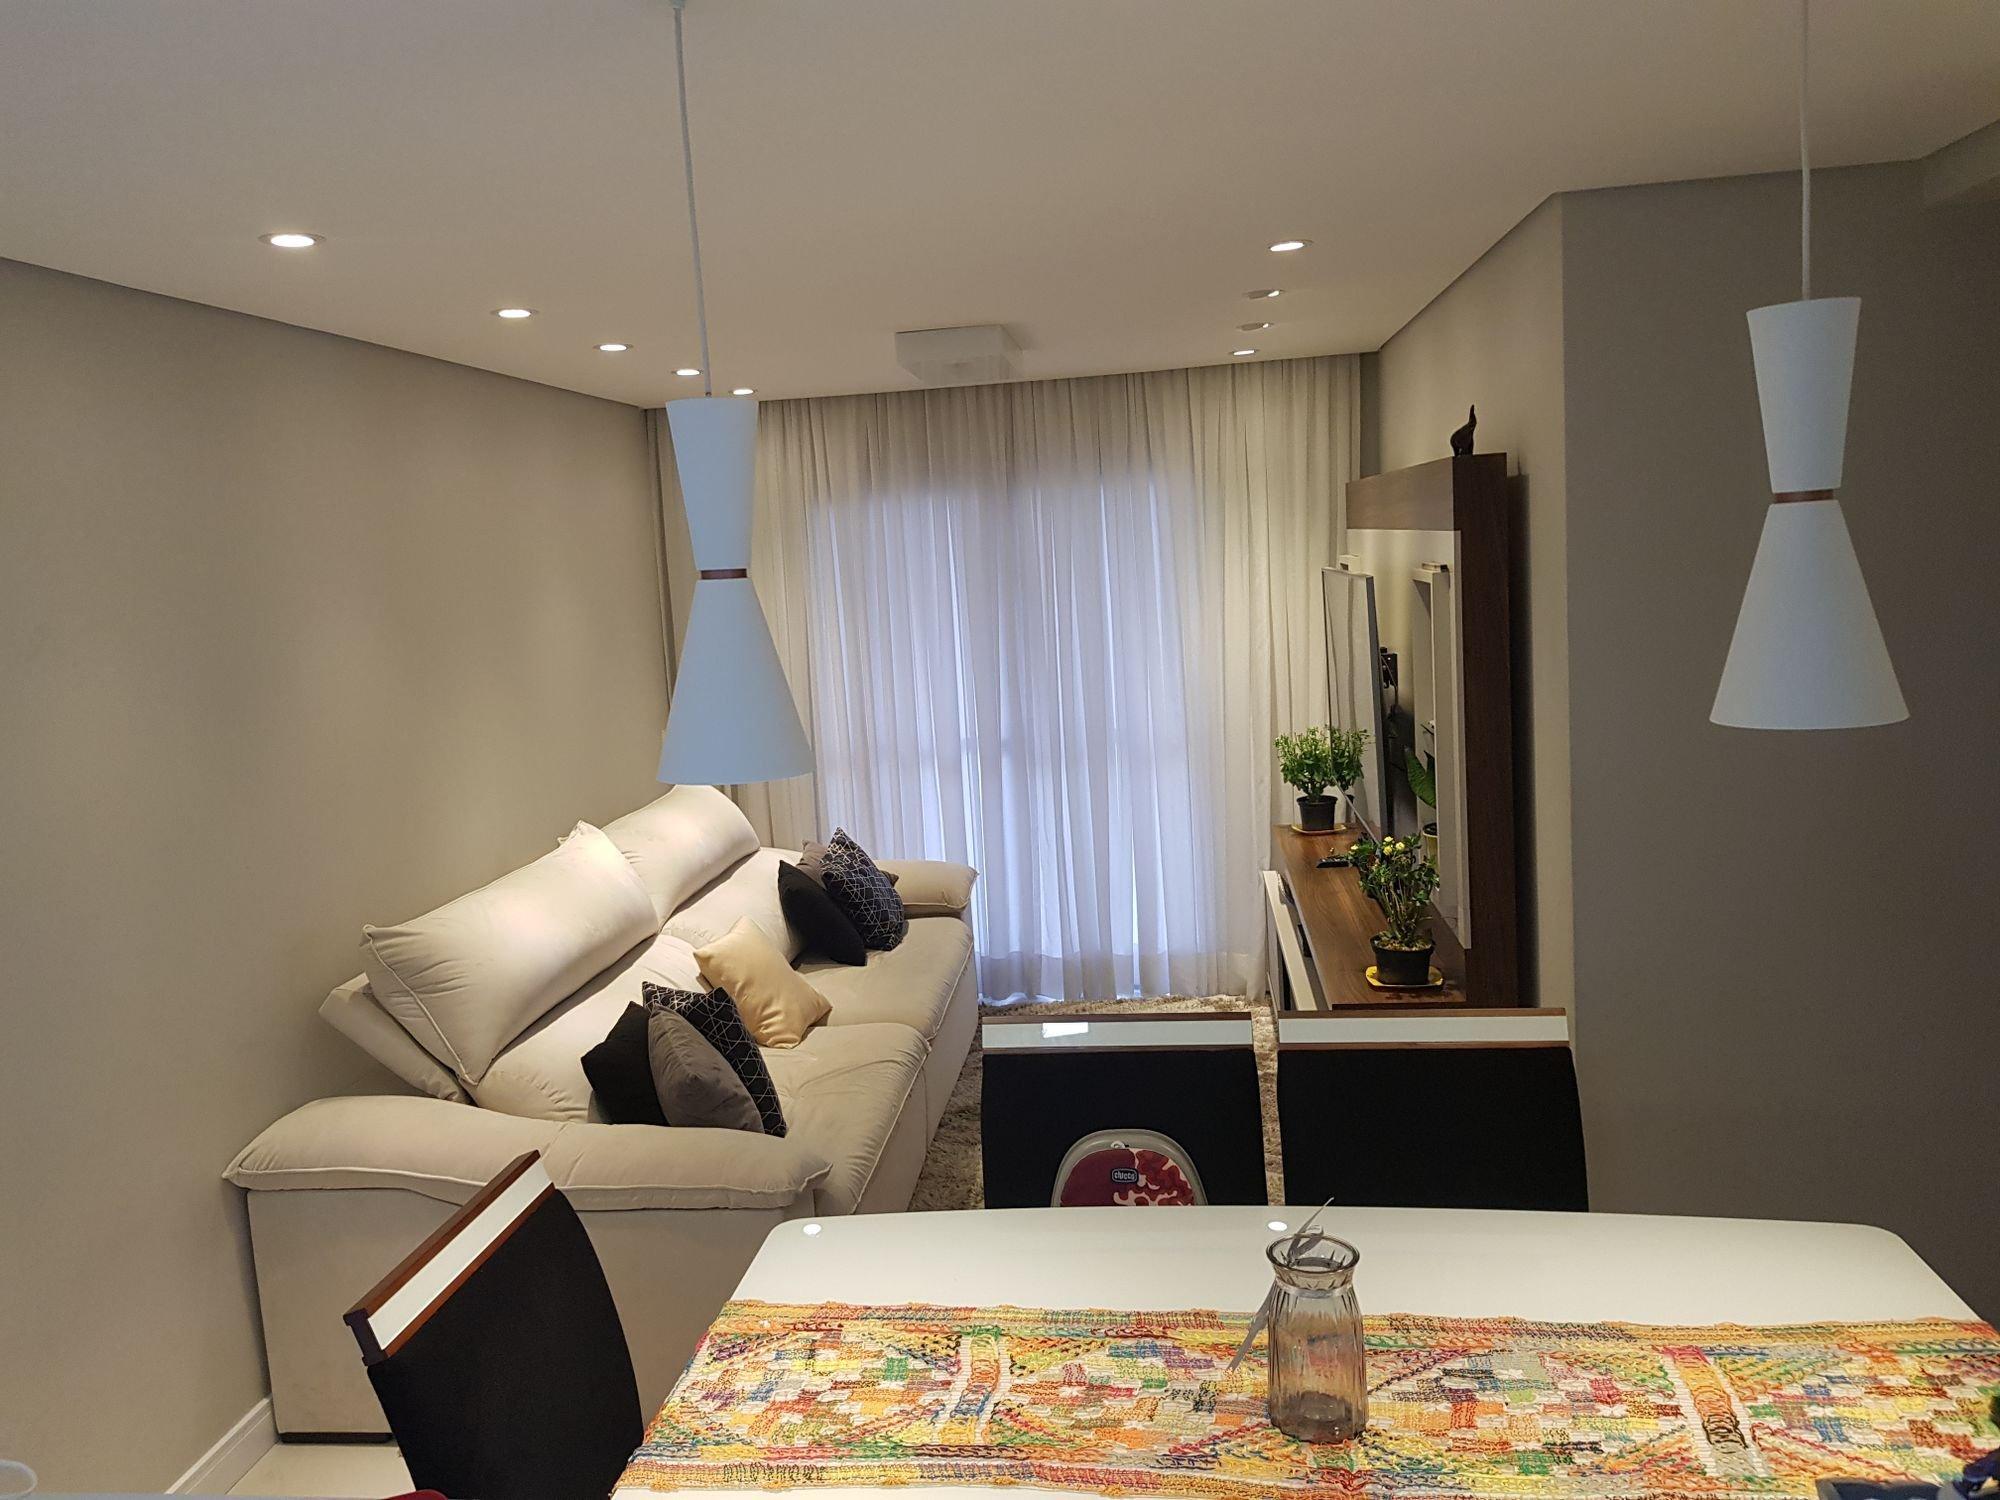 Foto de Sala com vaso de planta, sofá, cadeira, mesa de jantar